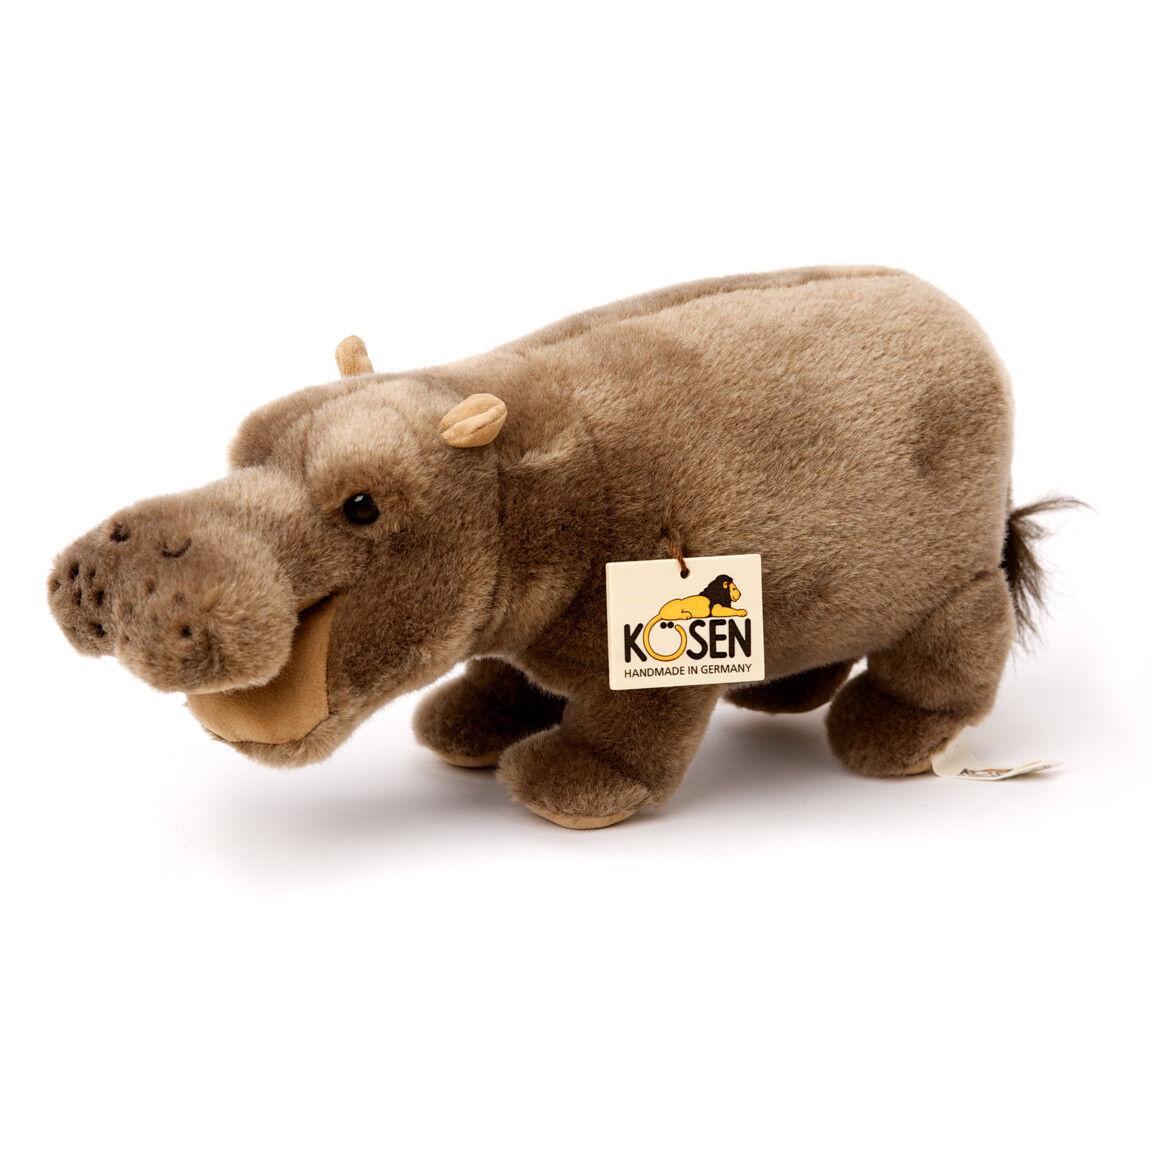 Hipopótamo - Coleccionable Juguete de Peluche - Kosen Kösen - 1925-28cm